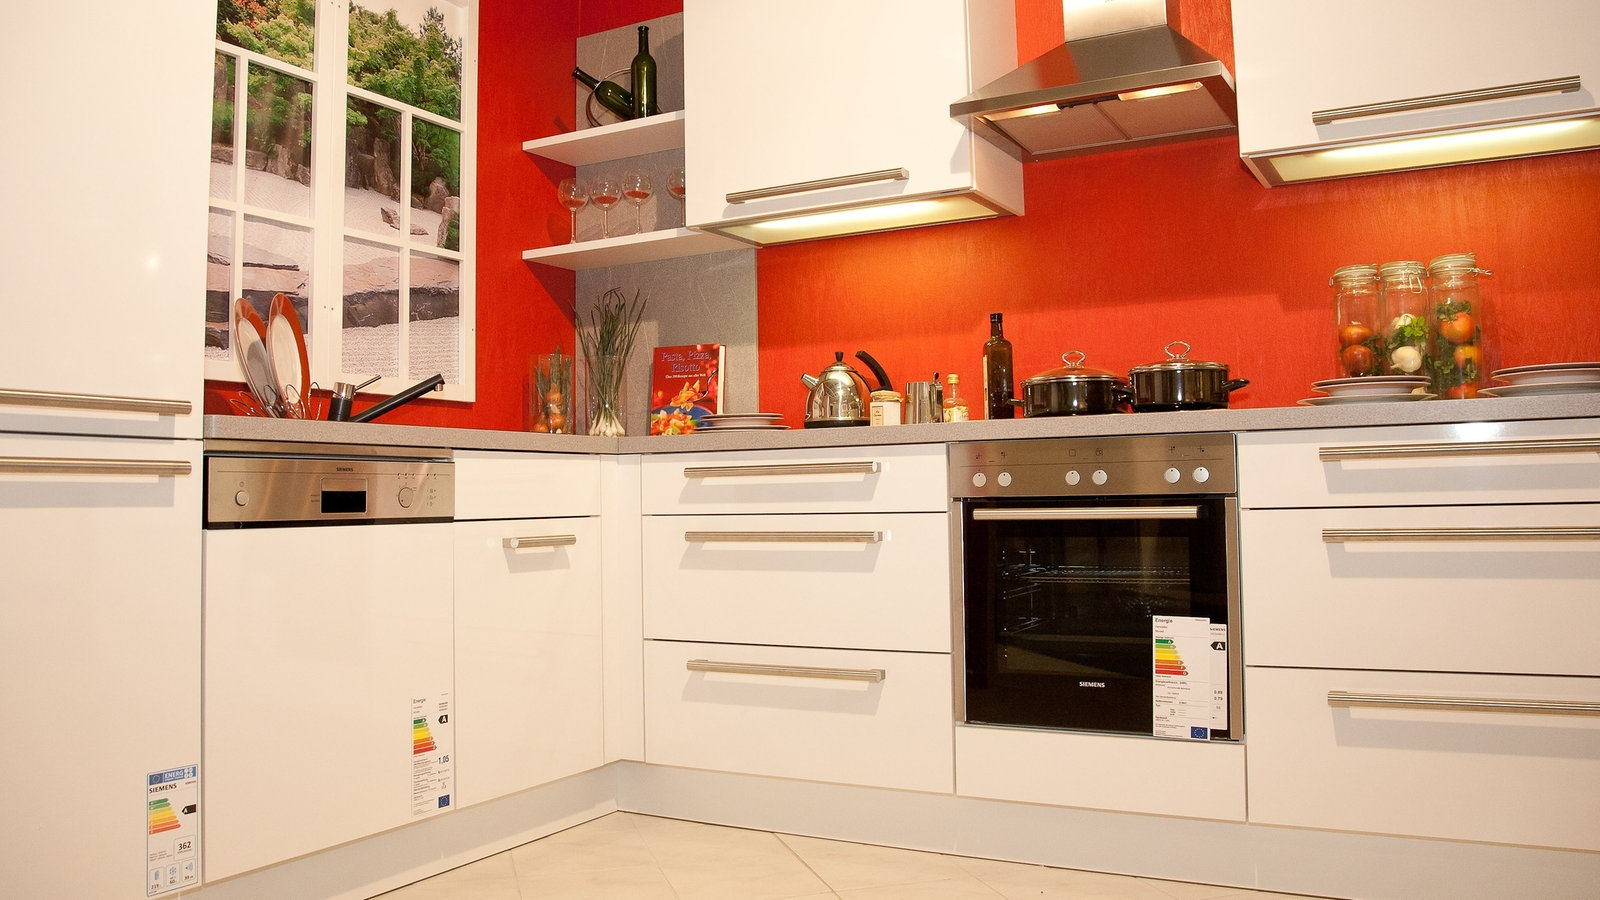 bauhaus frankfurter k che architektur kultur planet wissen. Black Bedroom Furniture Sets. Home Design Ideas